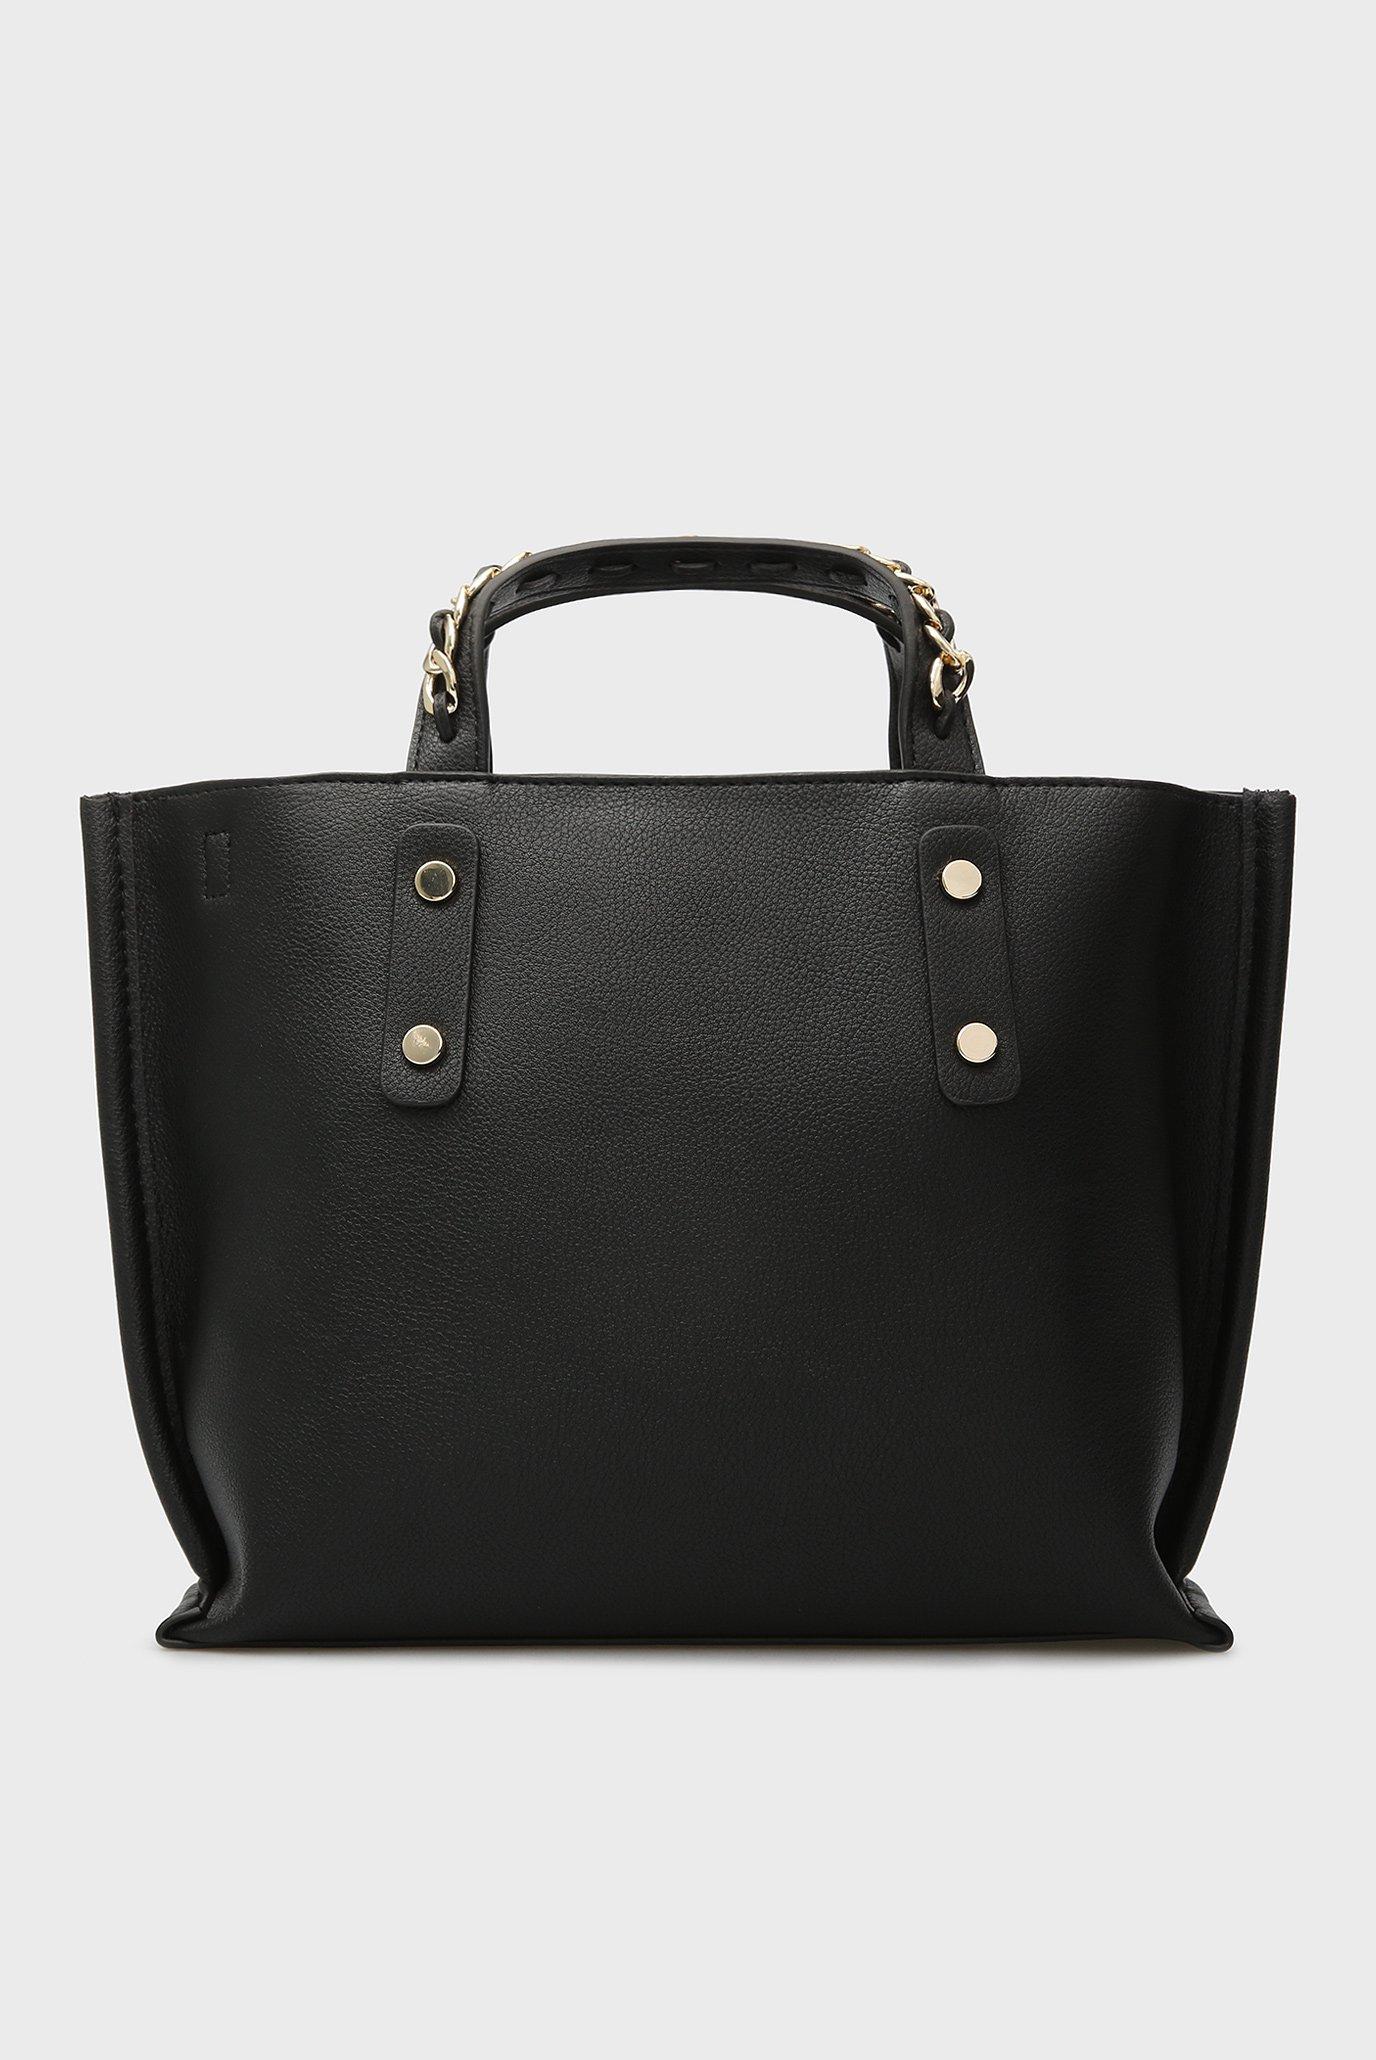 Купить Женская черная сумка на плечо CHAIN SMALL TOTE Tommy Hilfiger Tommy Hilfiger AW0AW05818 – Киев, Украина. Цены в интернет магазине MD Fashion